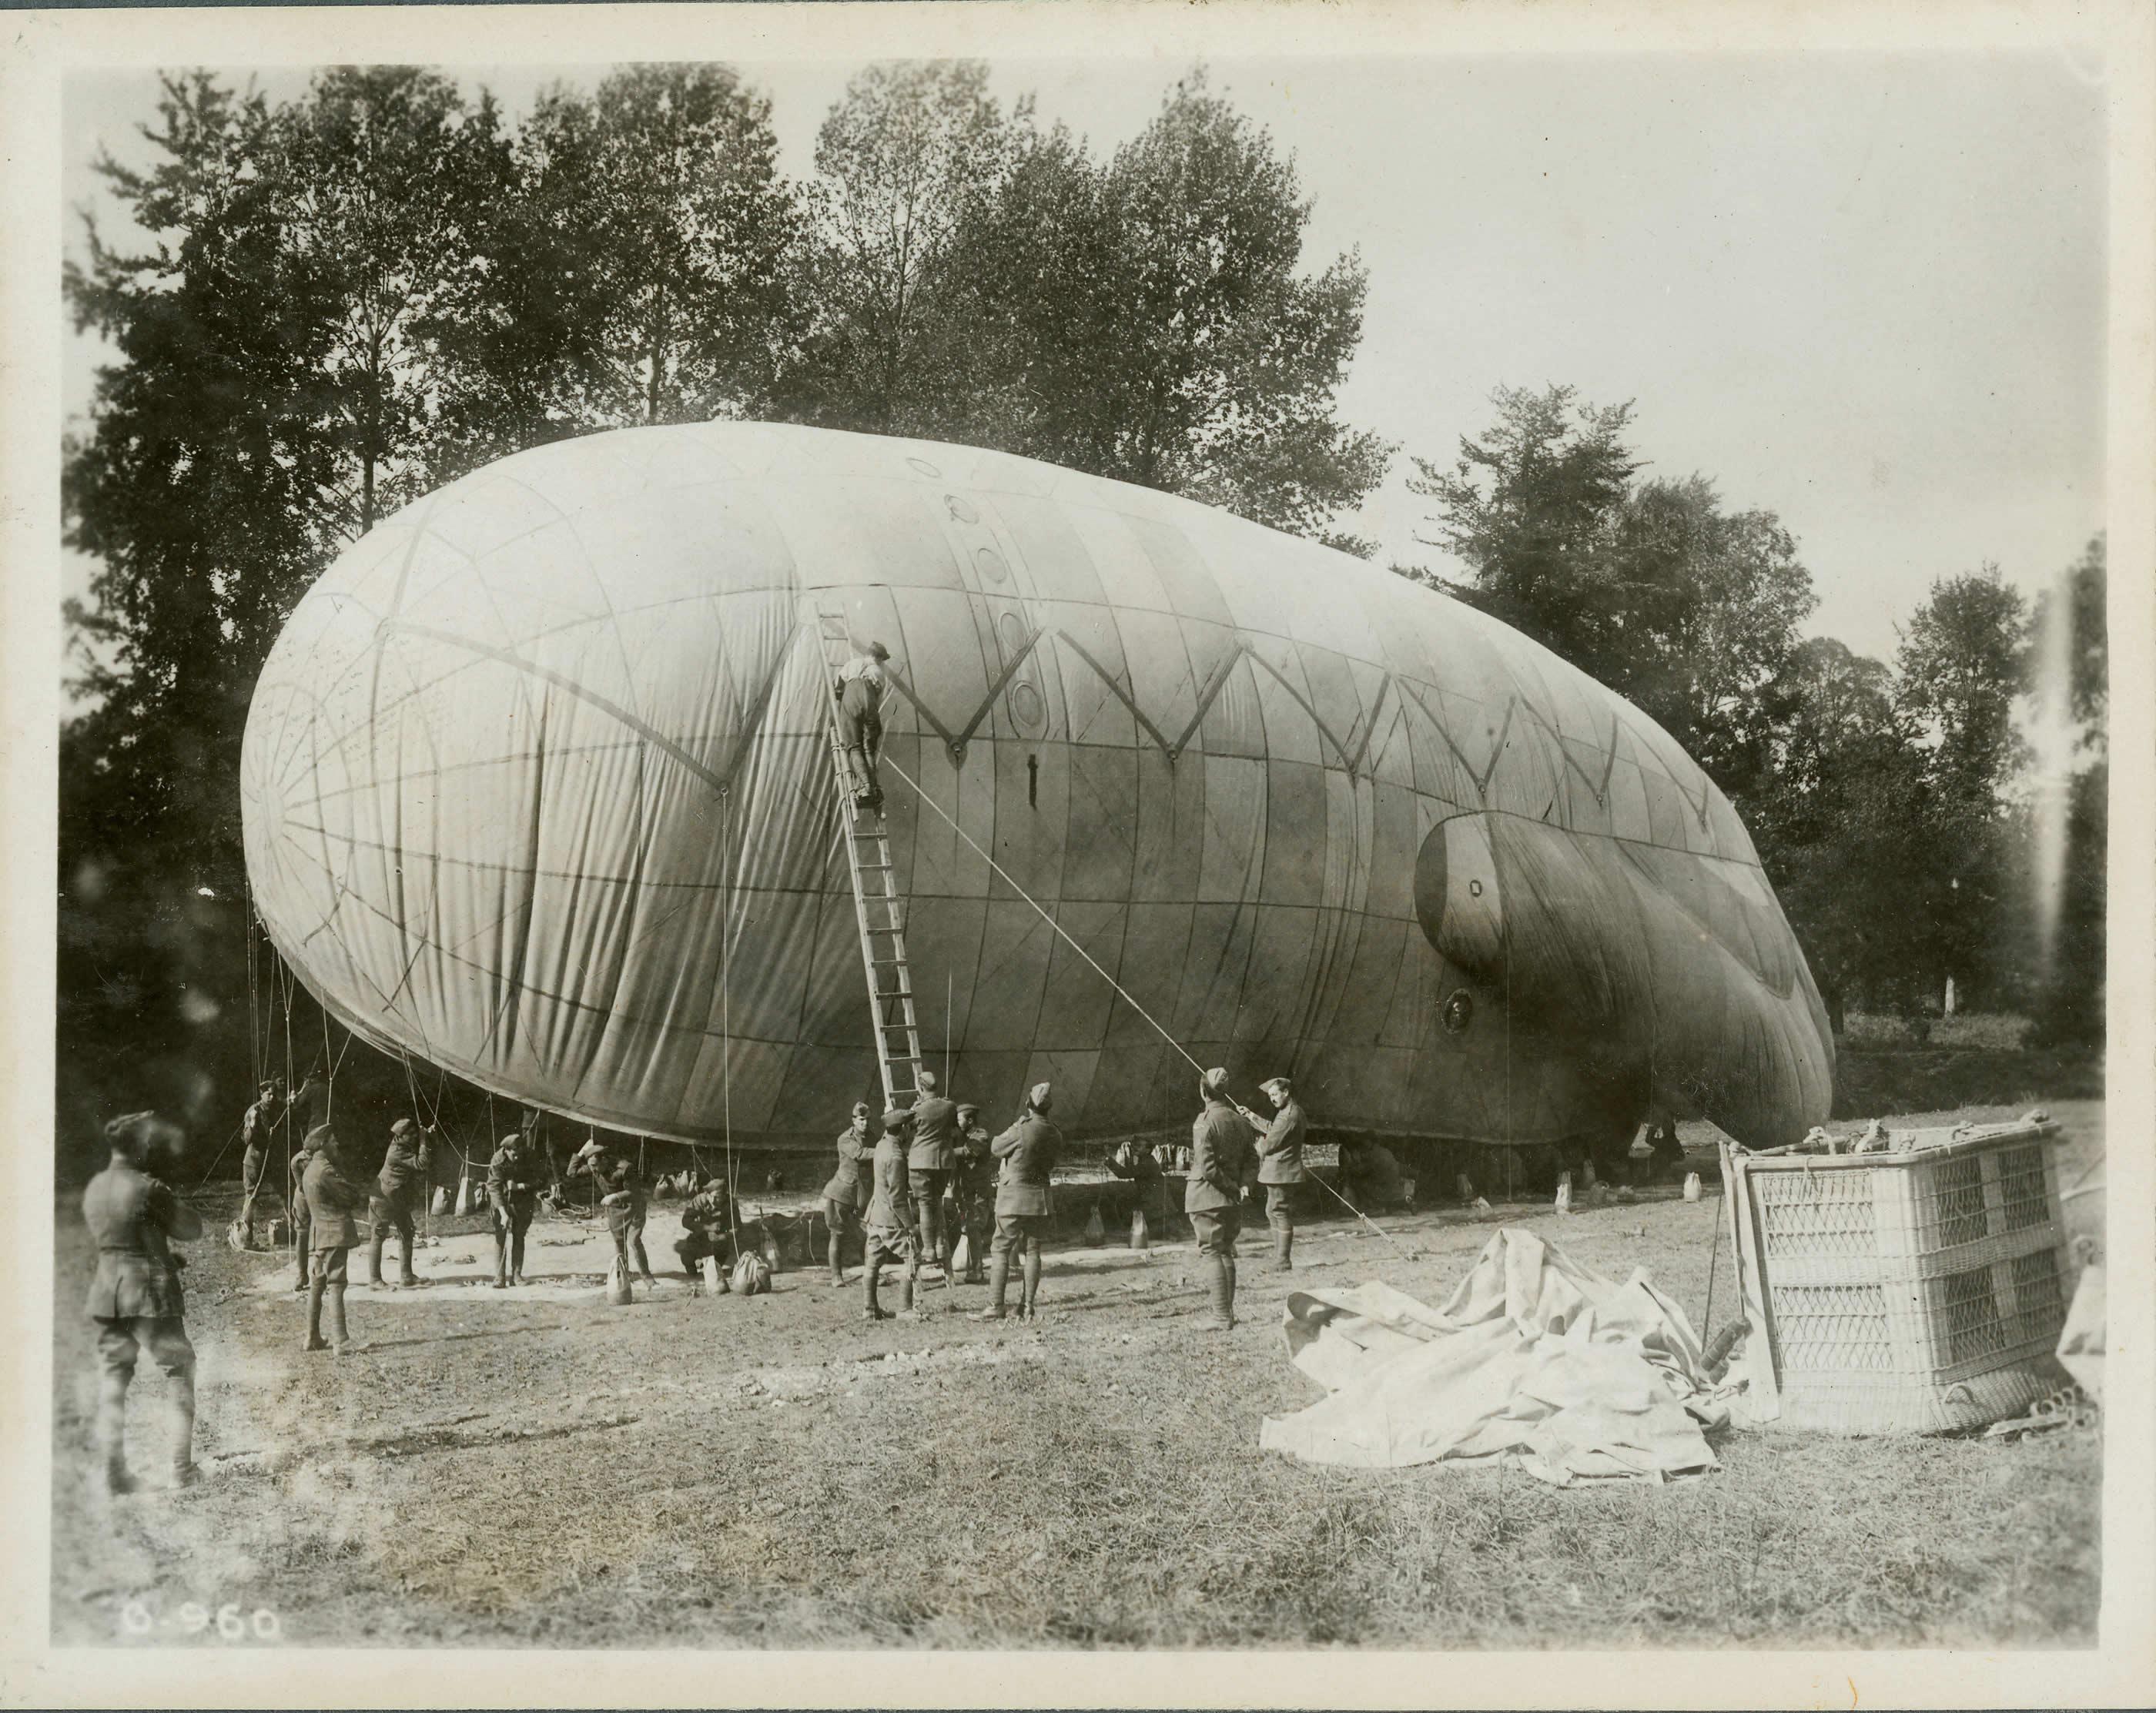 Kite Balloon